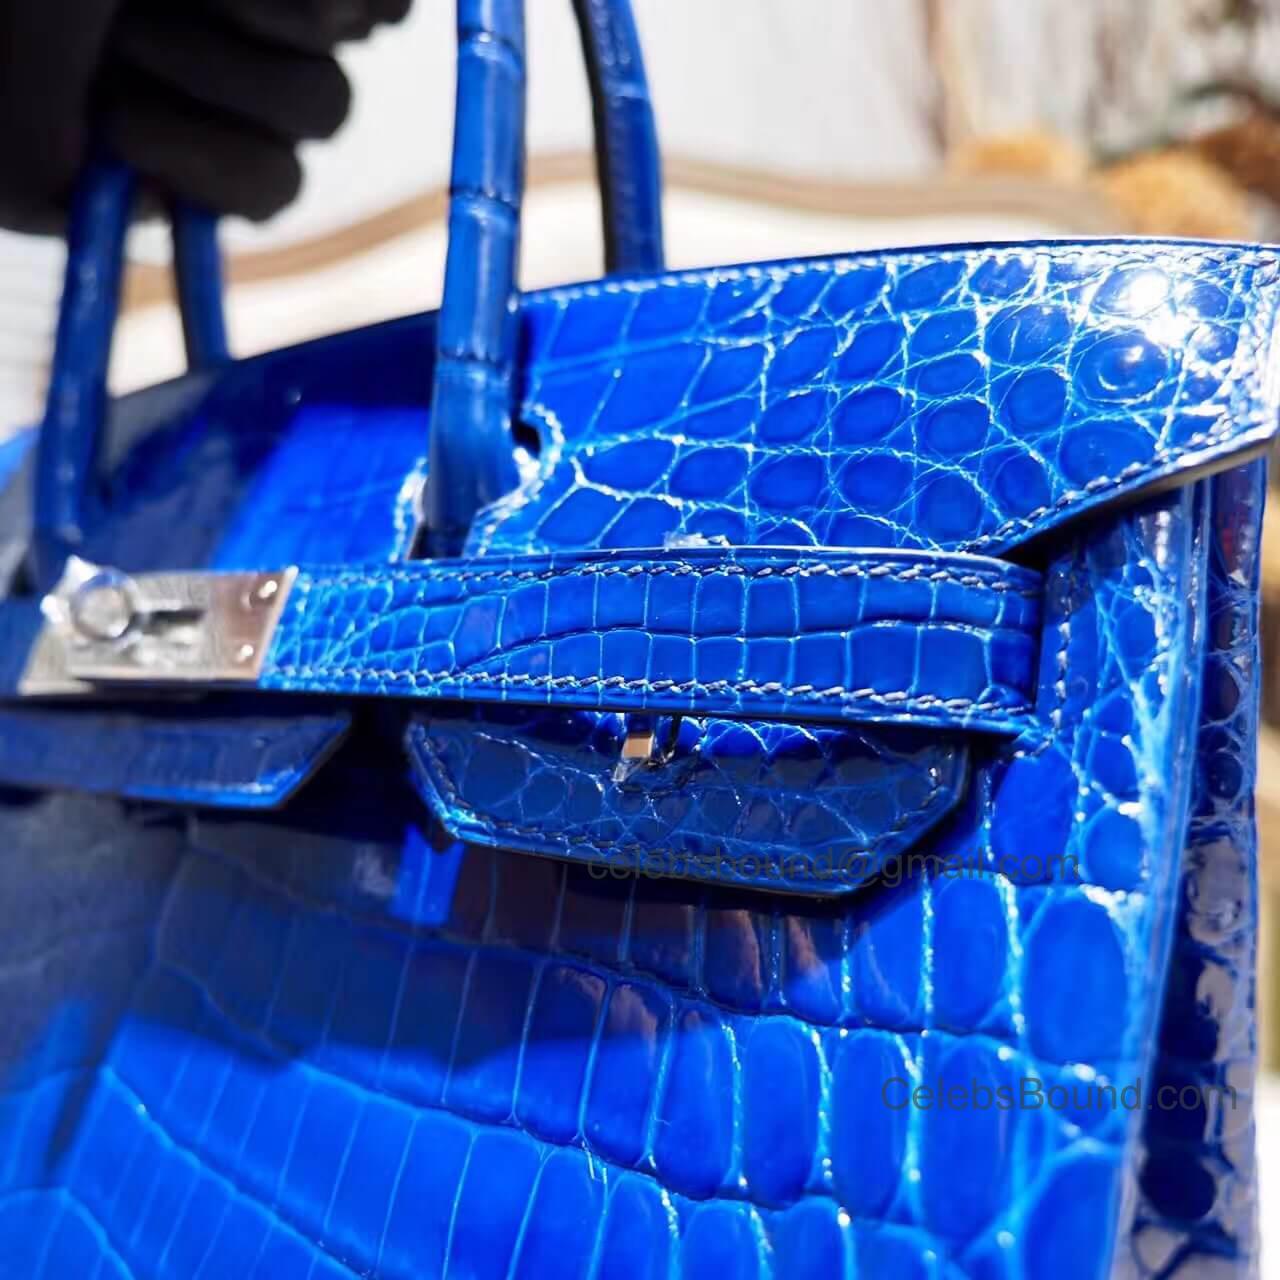 b69e804217 Copy Hermes Birkin 30 Bag in 7t Blue Electric Shiny Nile Croc PHW -